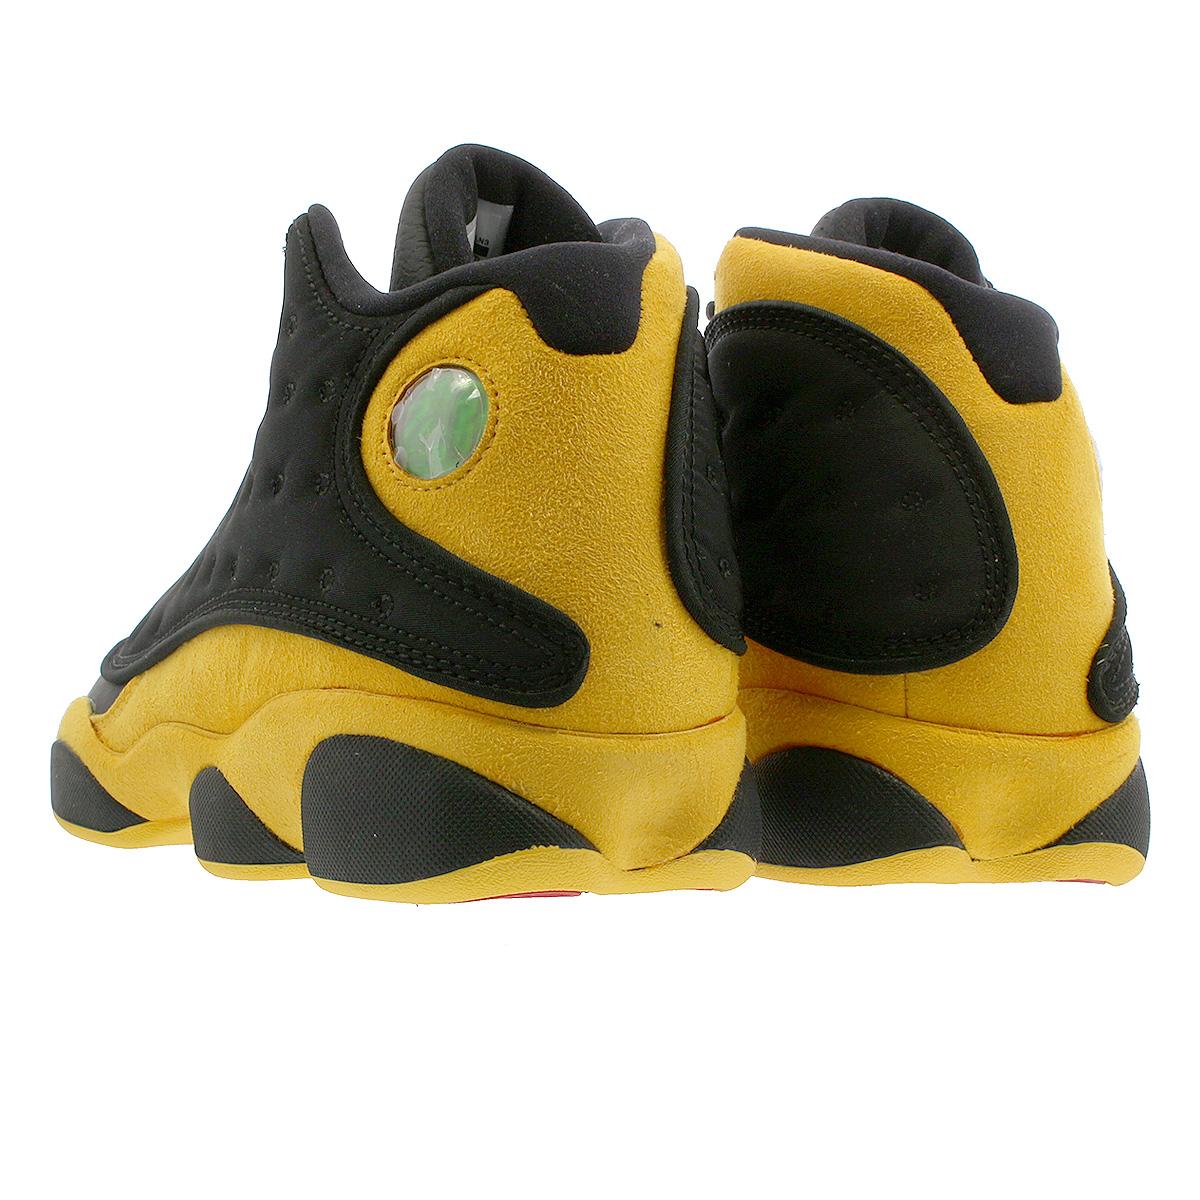 f646d978f712f5 NIKE AIR JORDAN 13 RETRO Nike Air Jordan 13 nostalgic BLACK UNIVERSITY  RED UNIVERSITY GOLD 414